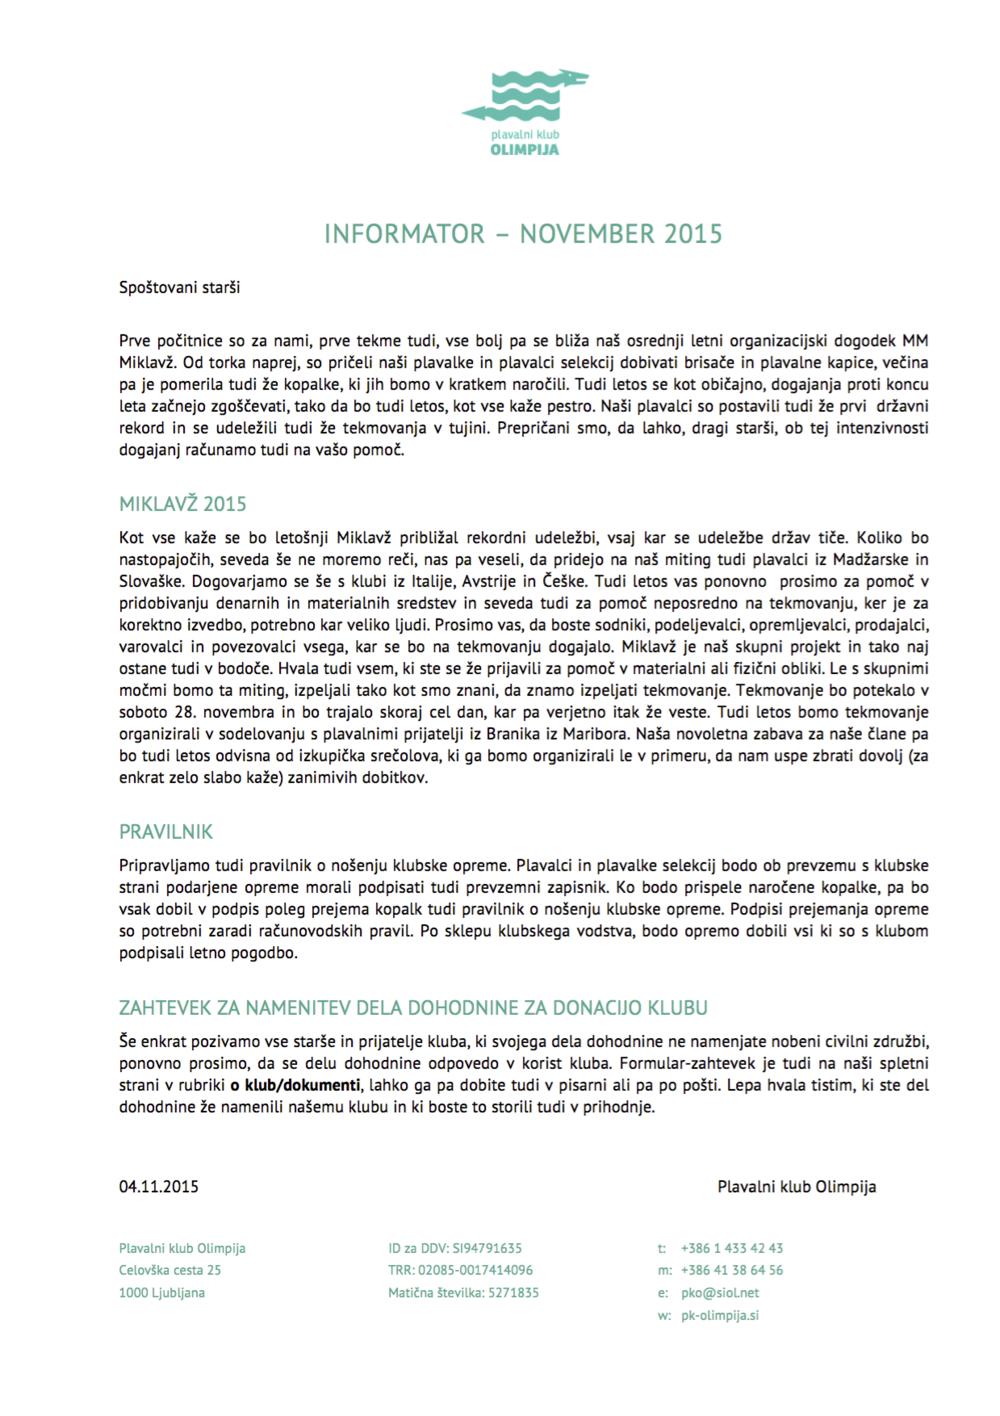 pko-informator-201511.png